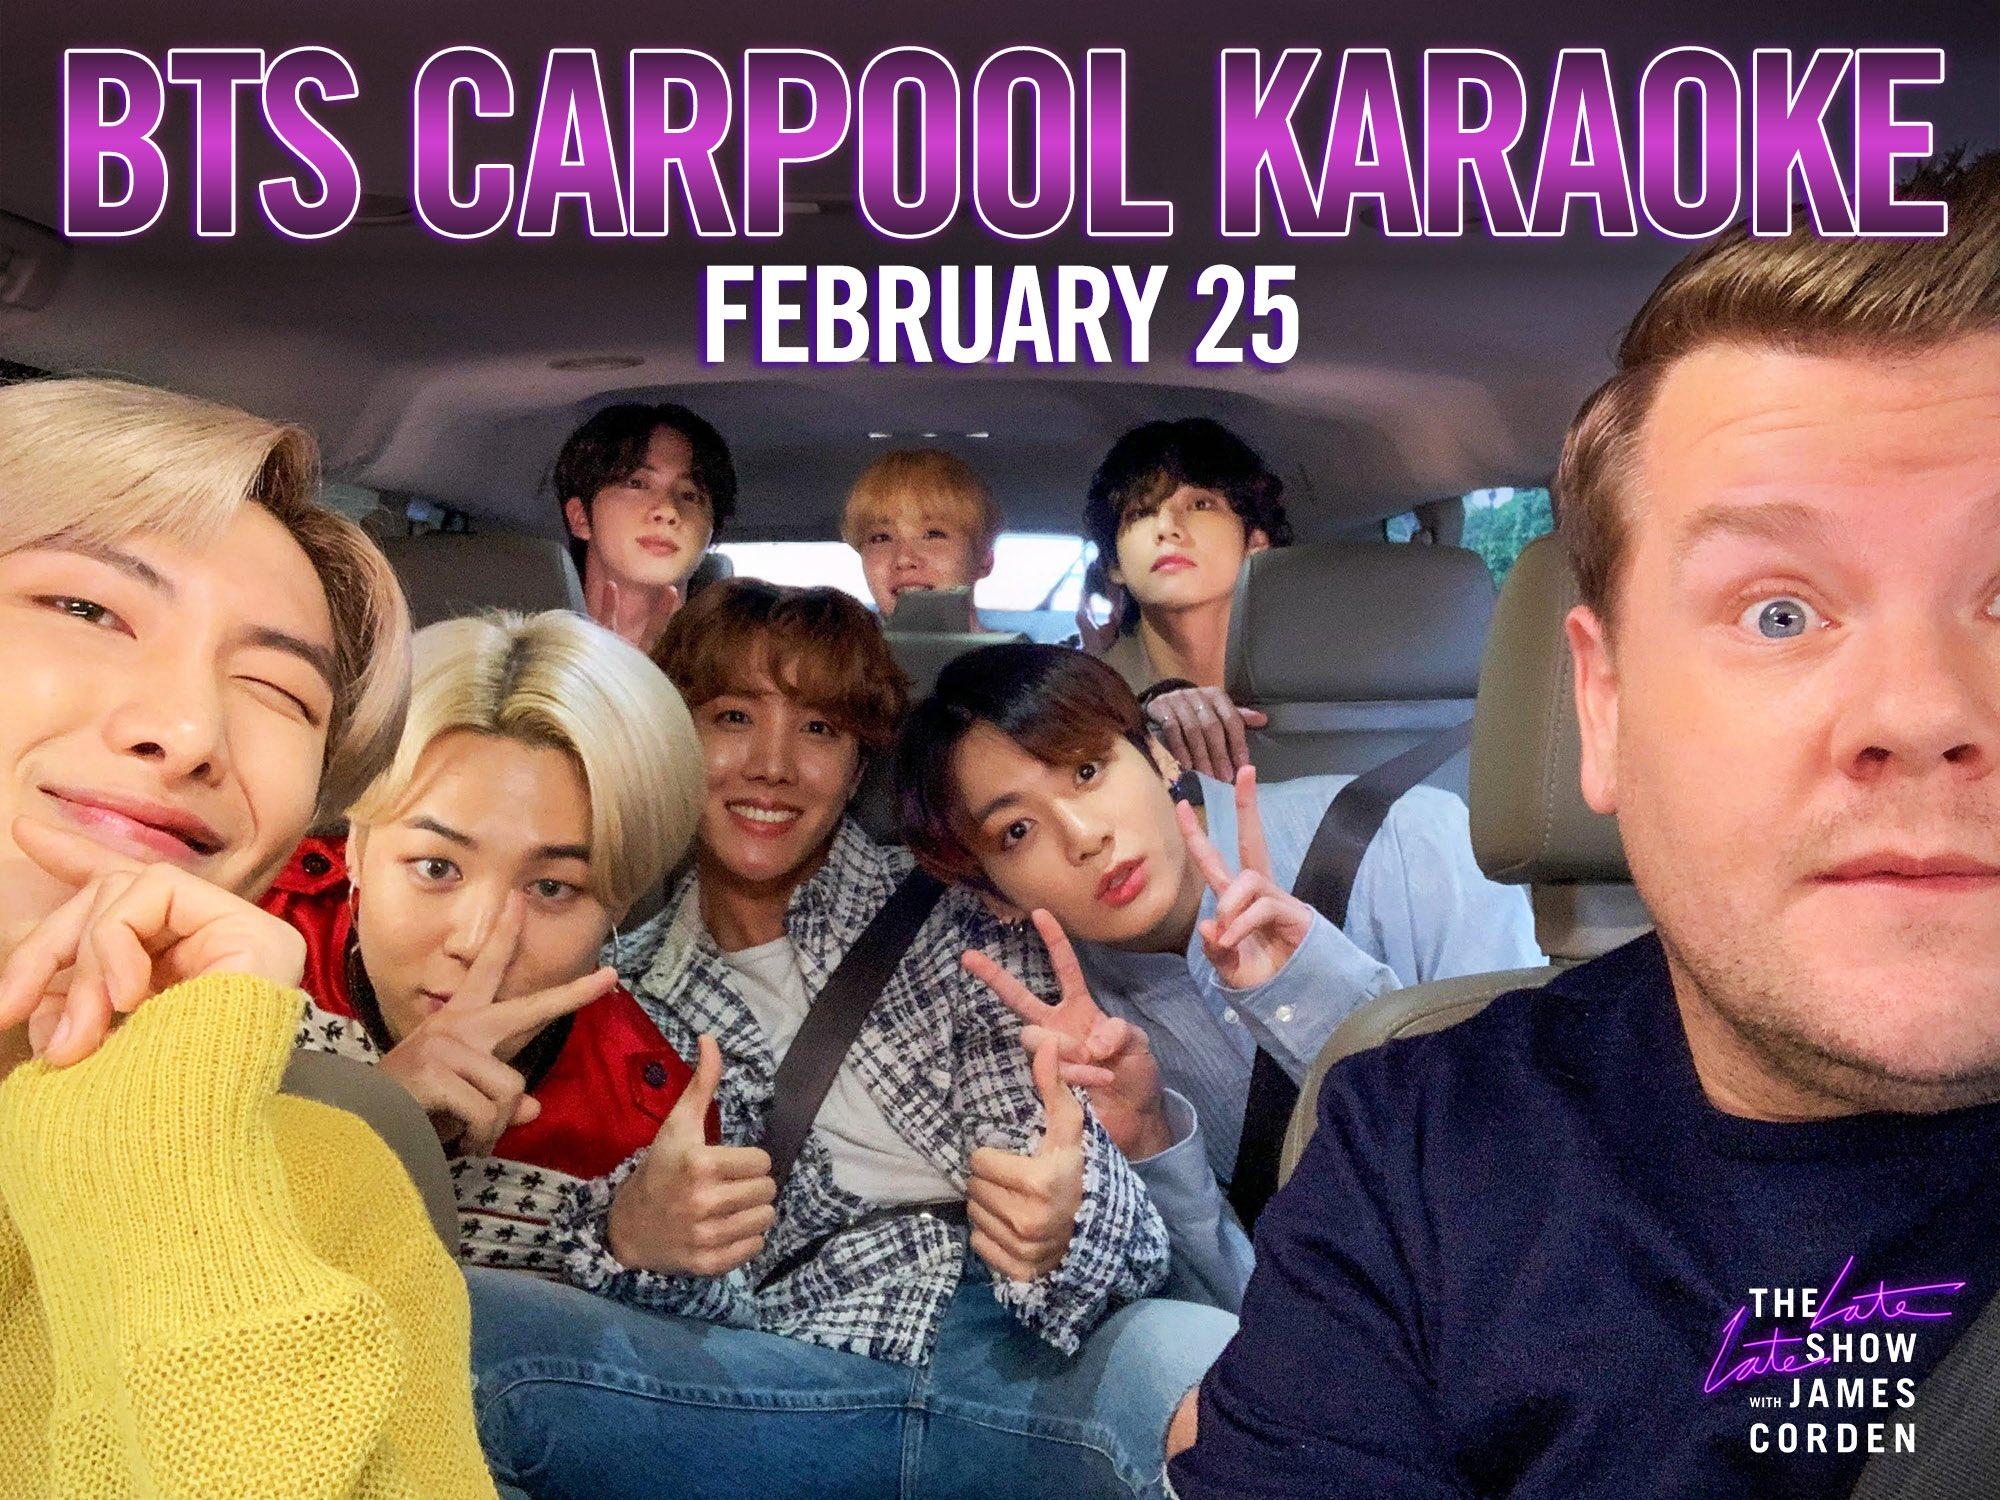 BTS Carpool Karaoke Bersama James Corden, Penantian Panjang ARMY Akhirnya Terbayar